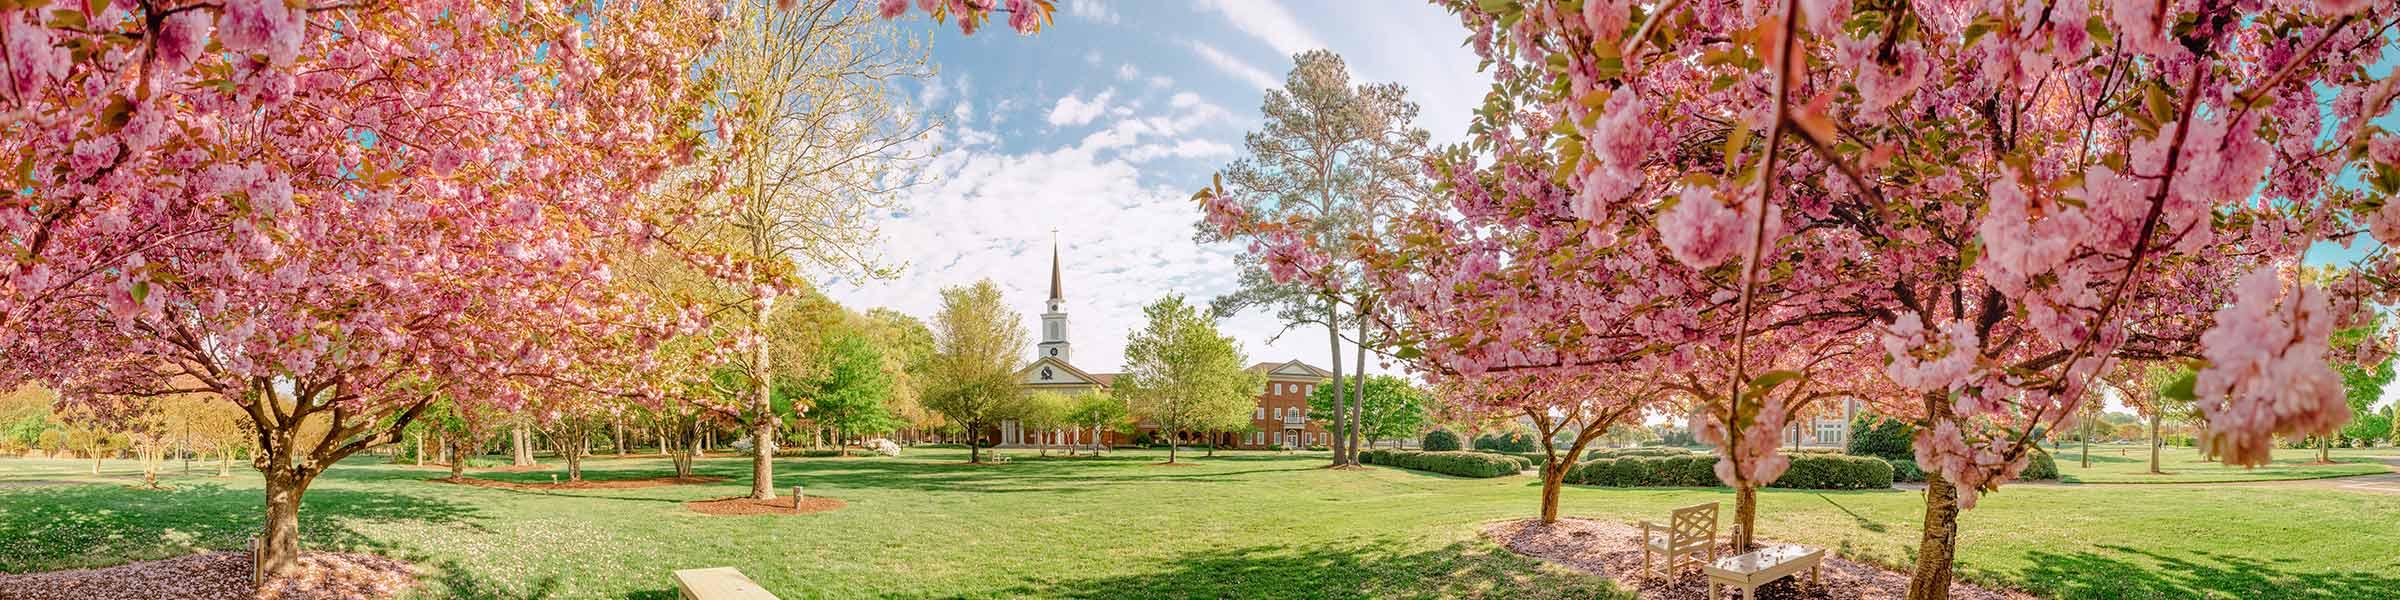 Regent University offers undergraduate and graduate degrees online and on-campus in Virginia Beach, VA 23464.